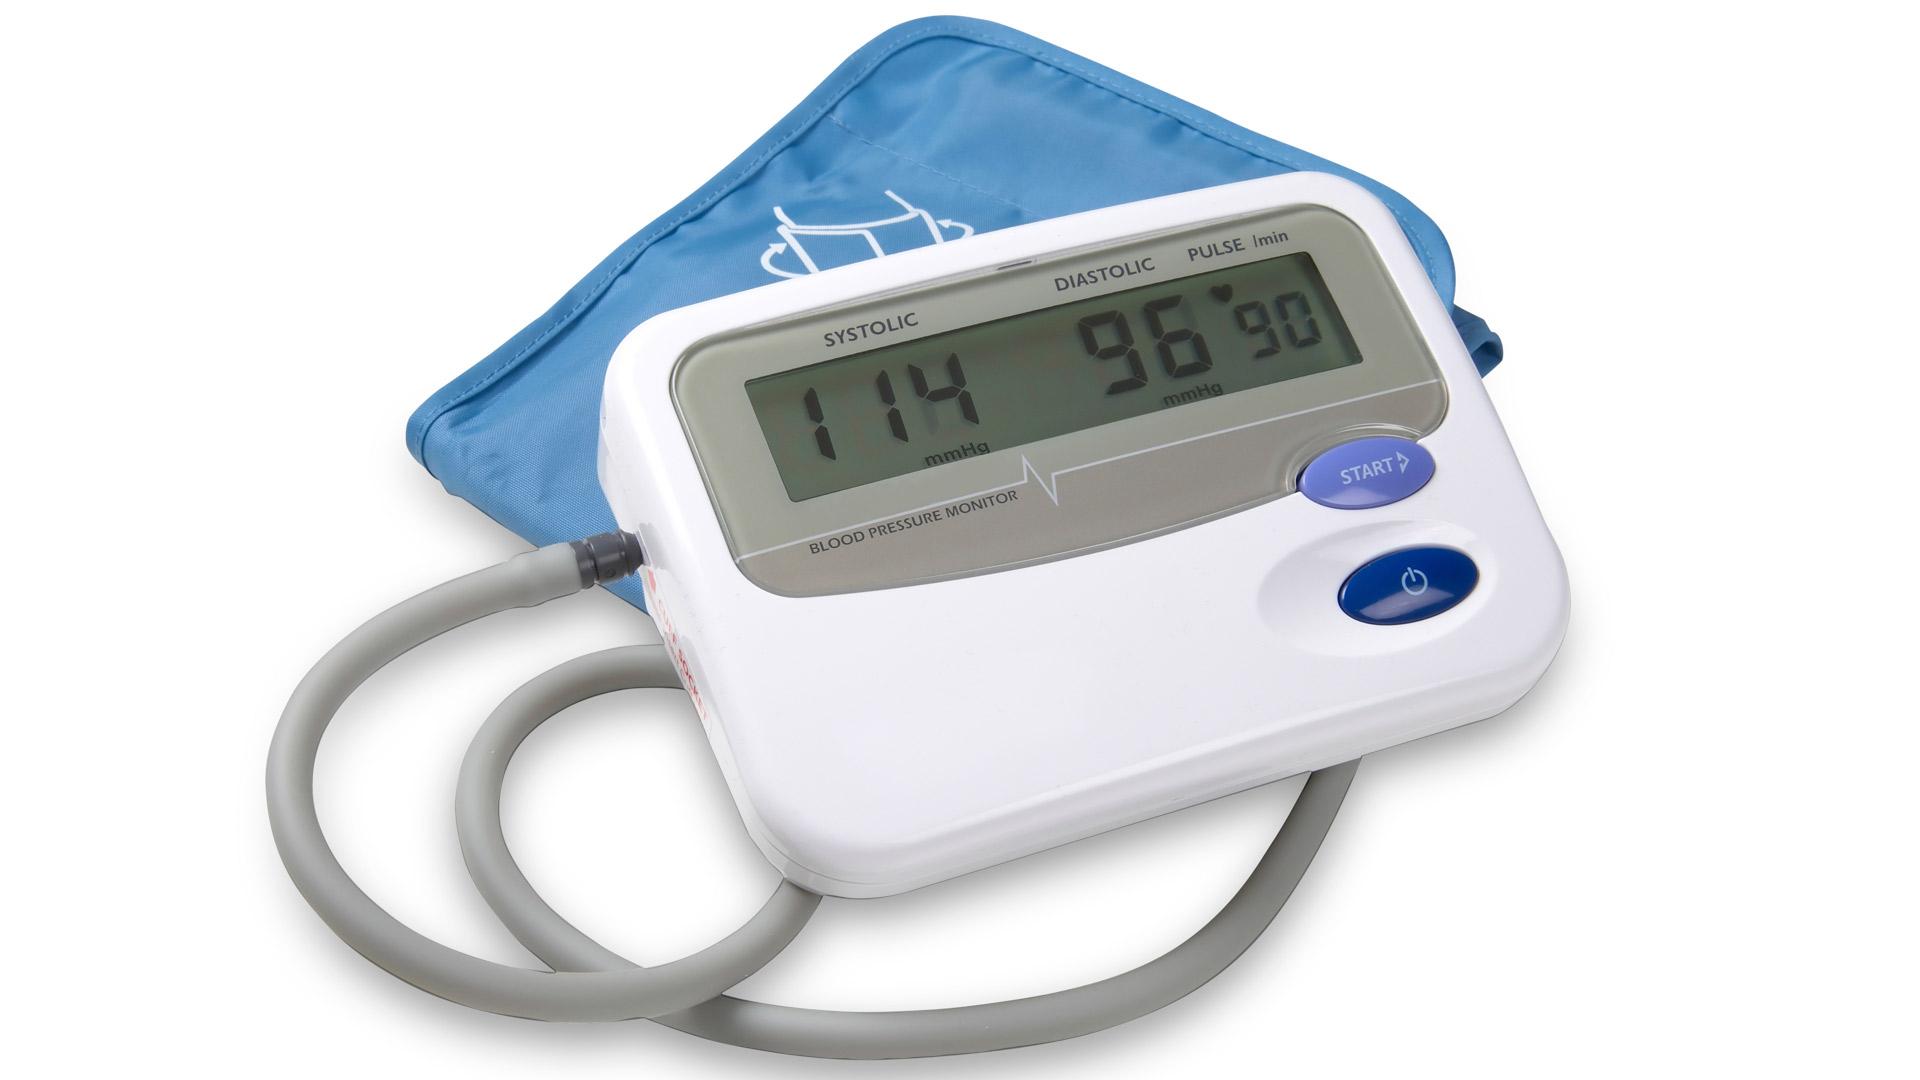 Kun stressi vähenee, myös verenpaine laskee.